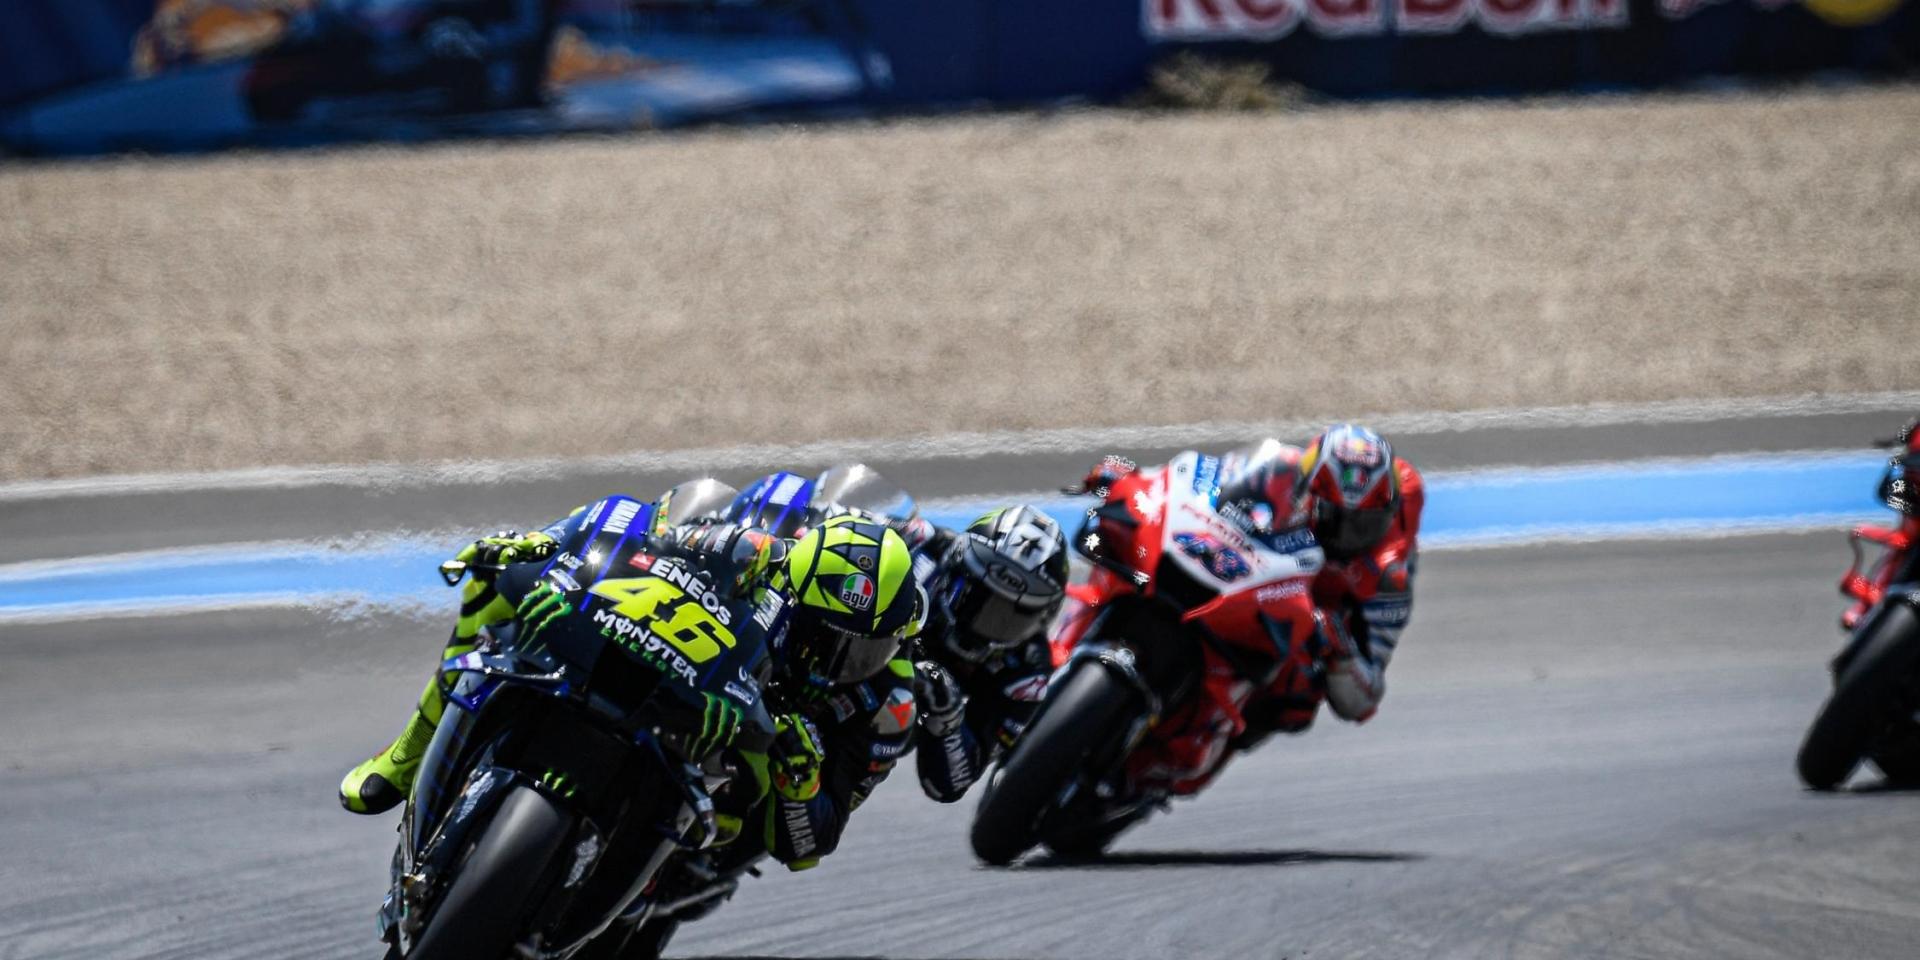 Rossi Style在捷克能否派上用場,將是Valentino Rossi再度挑戰頒獎台的關鍵!